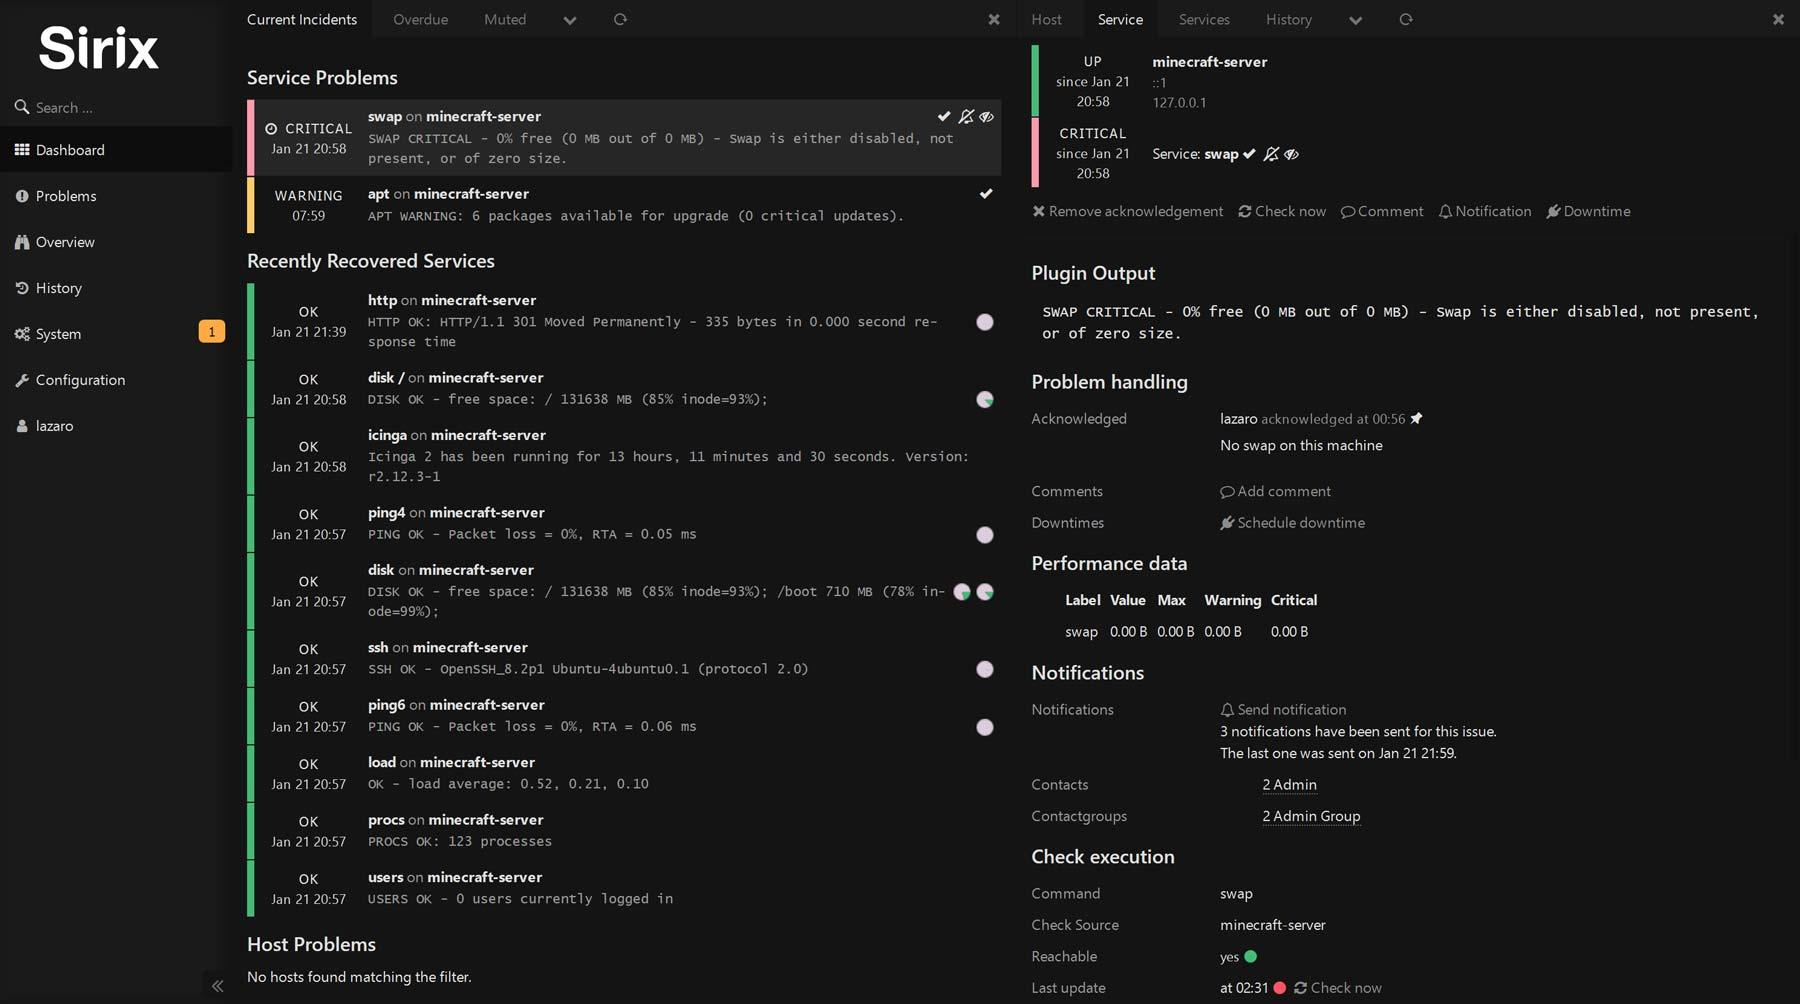 sirix-uptime-monitoring-collaborative